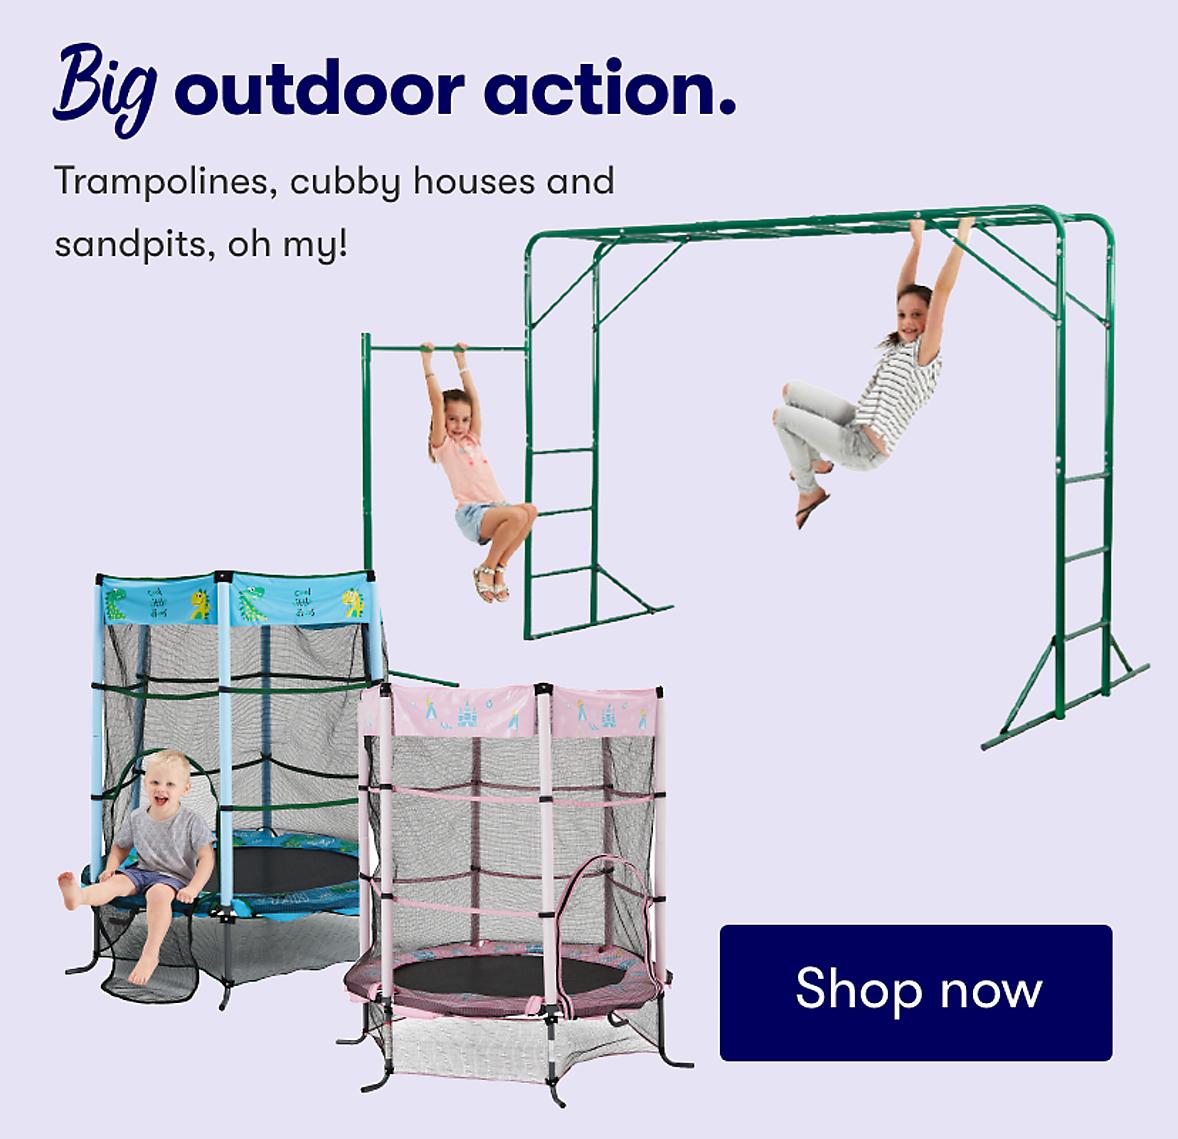 Big outdoor action